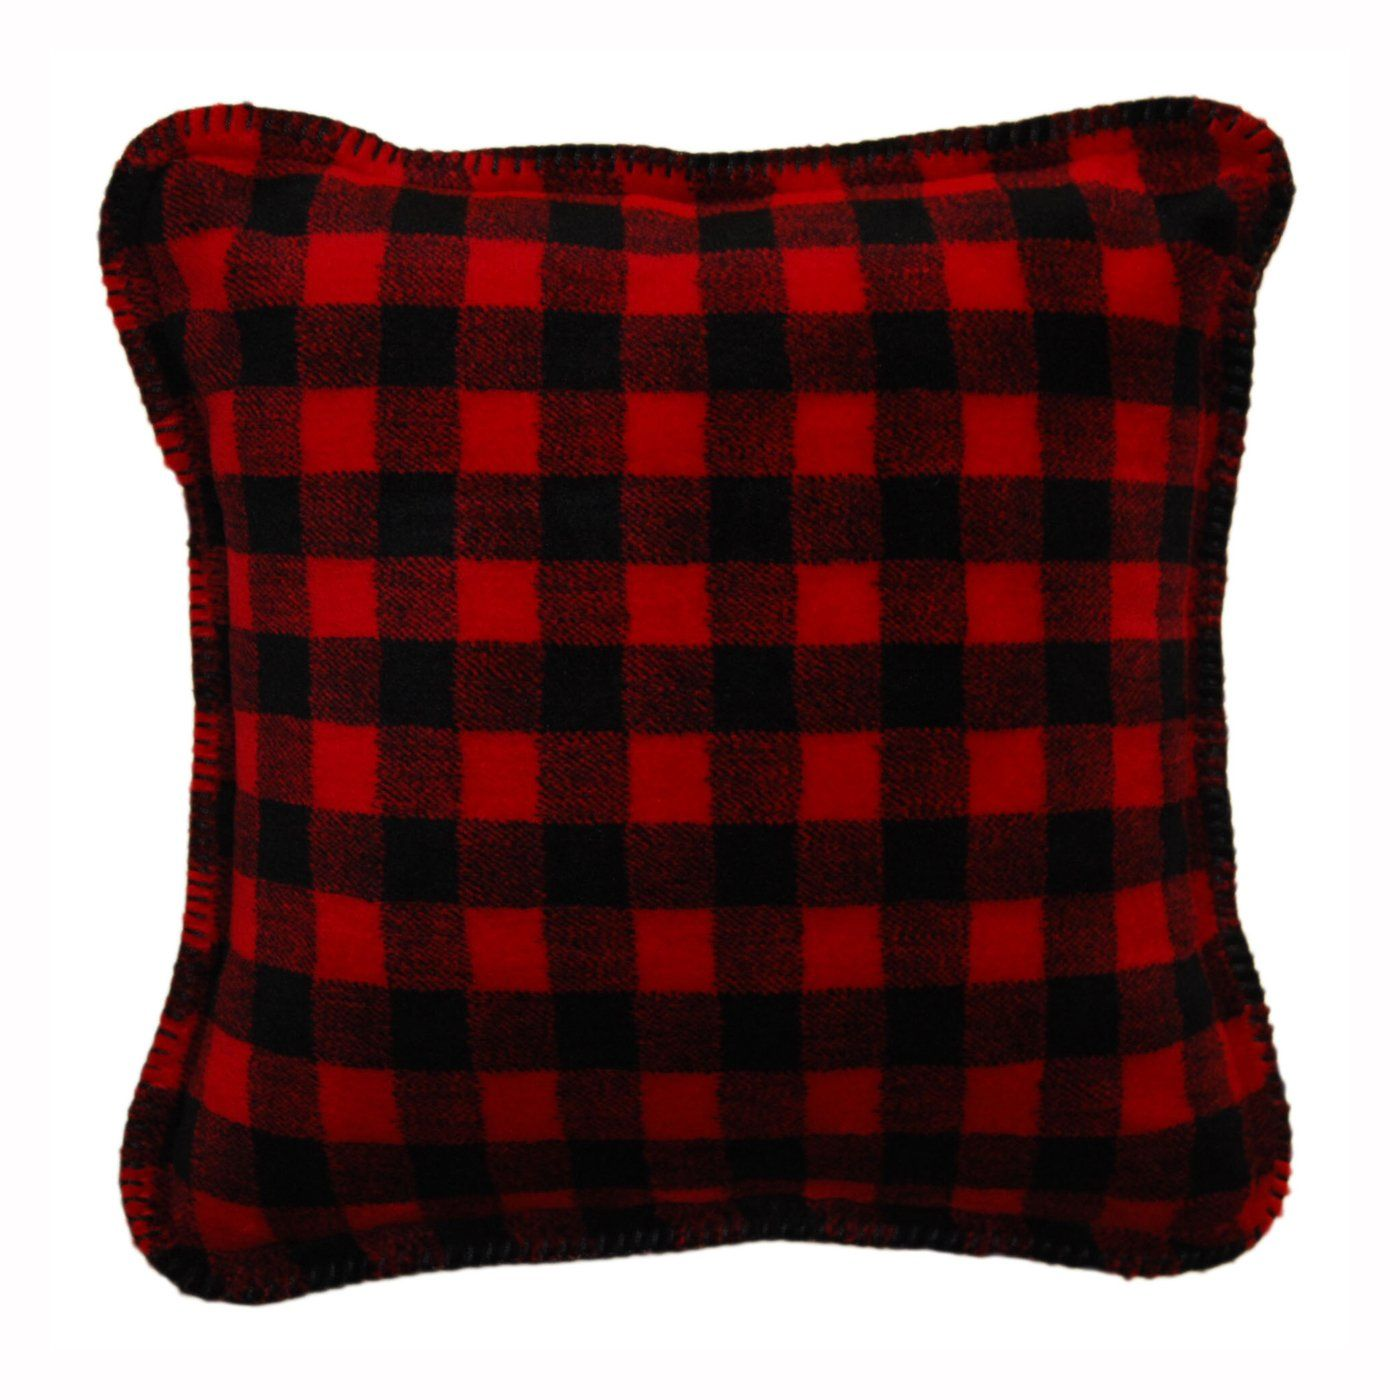 Plush Buffalo Plaid Rug: Denali Home Red Black Buffalo Check Decorative Pillow